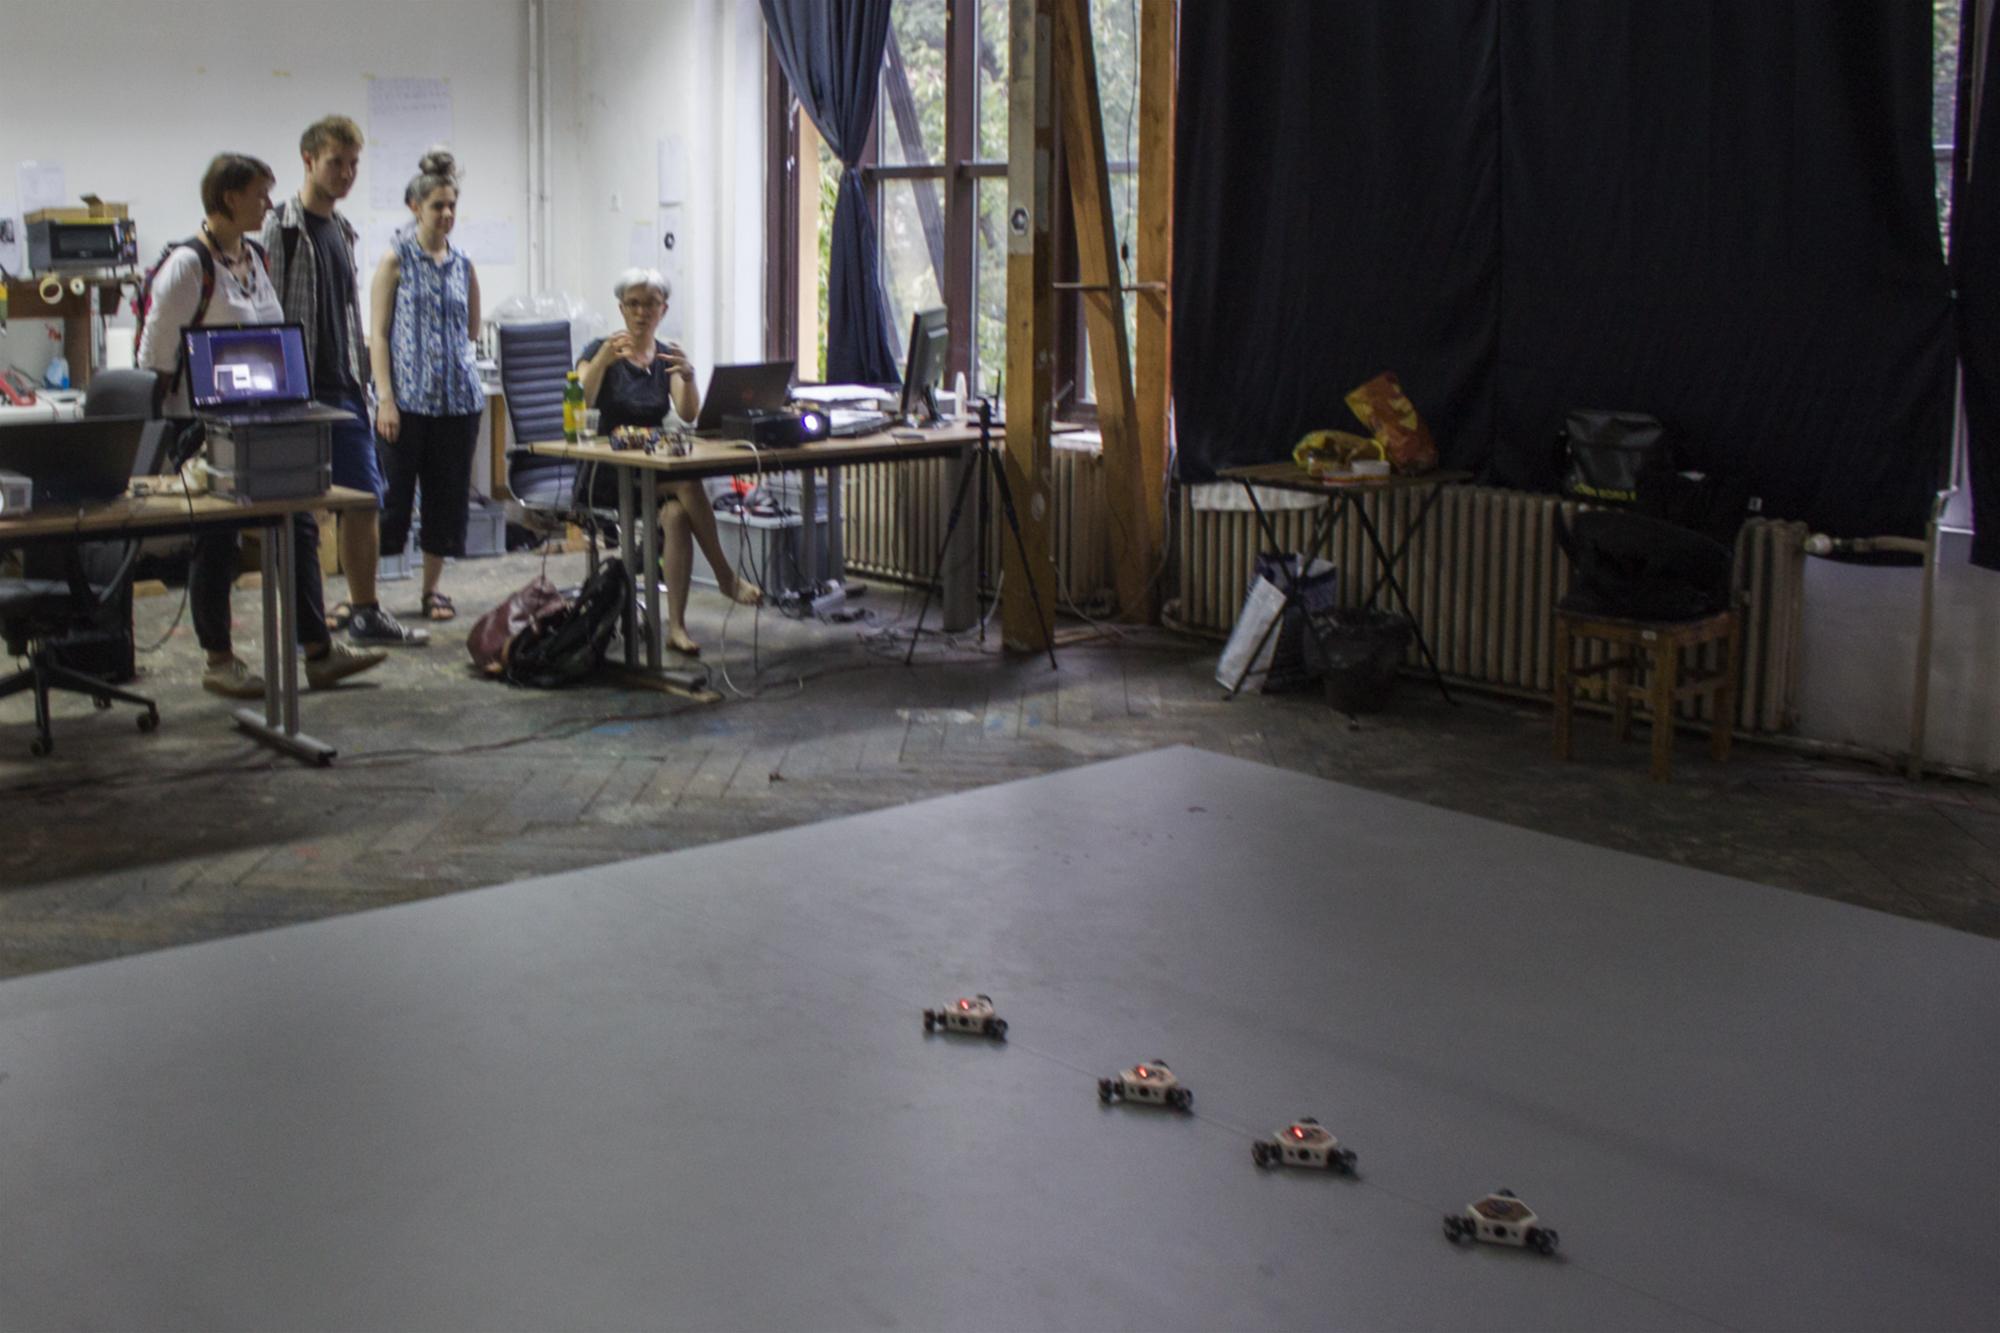 open_studio_empathy_swarm_robots_sm_0019_05